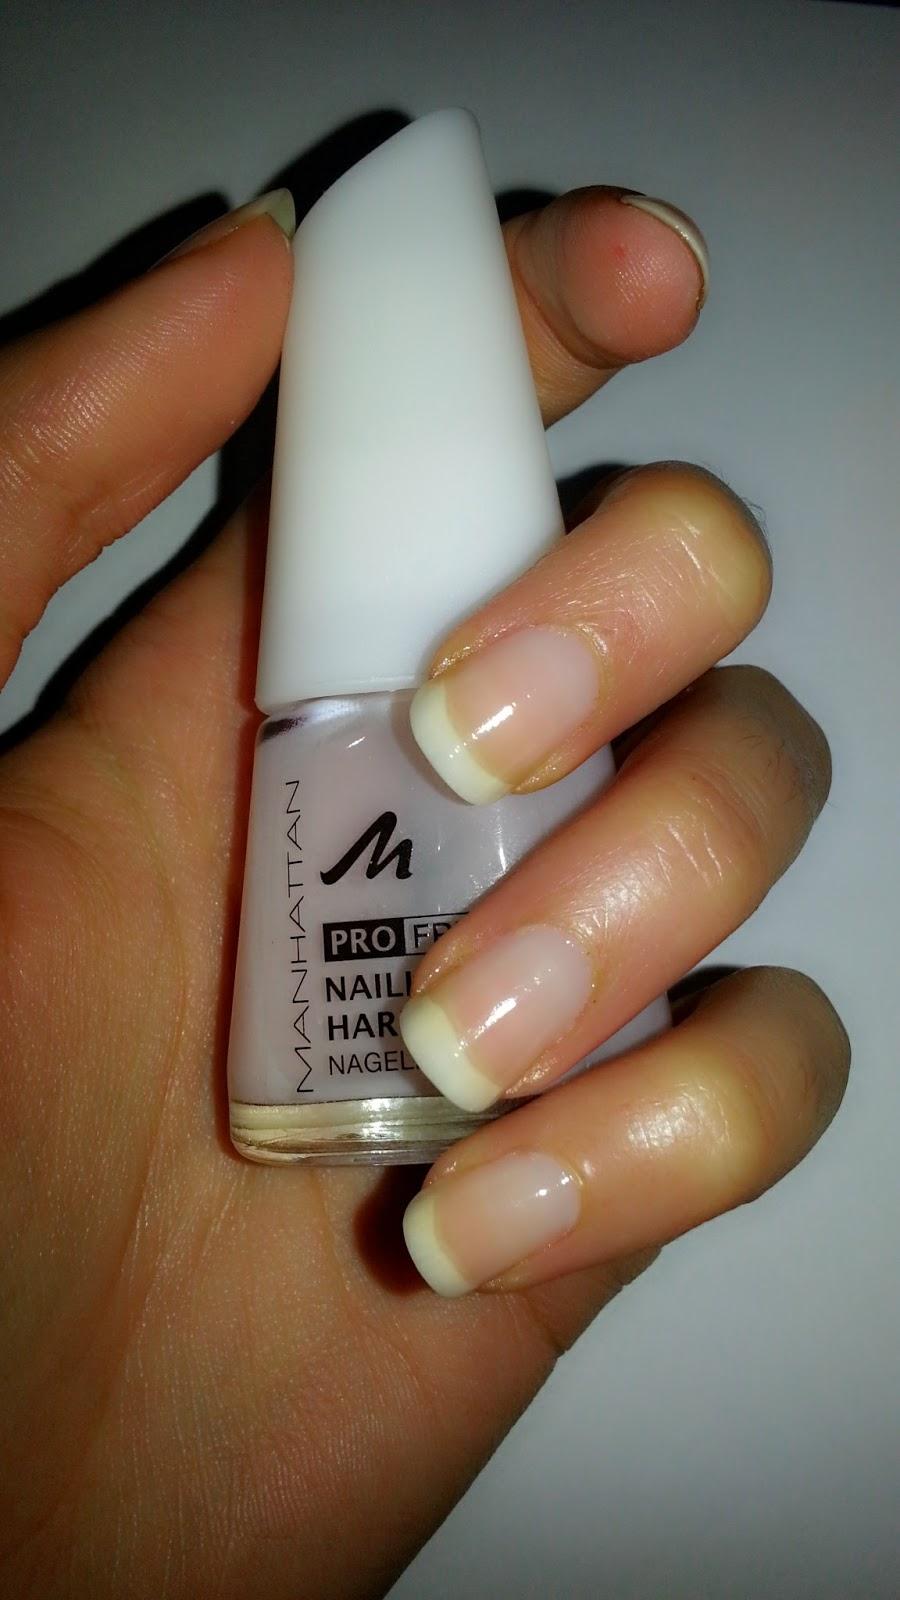 nageldesign lernen - Crystal Nails professionelles Nageldesign Zubehör